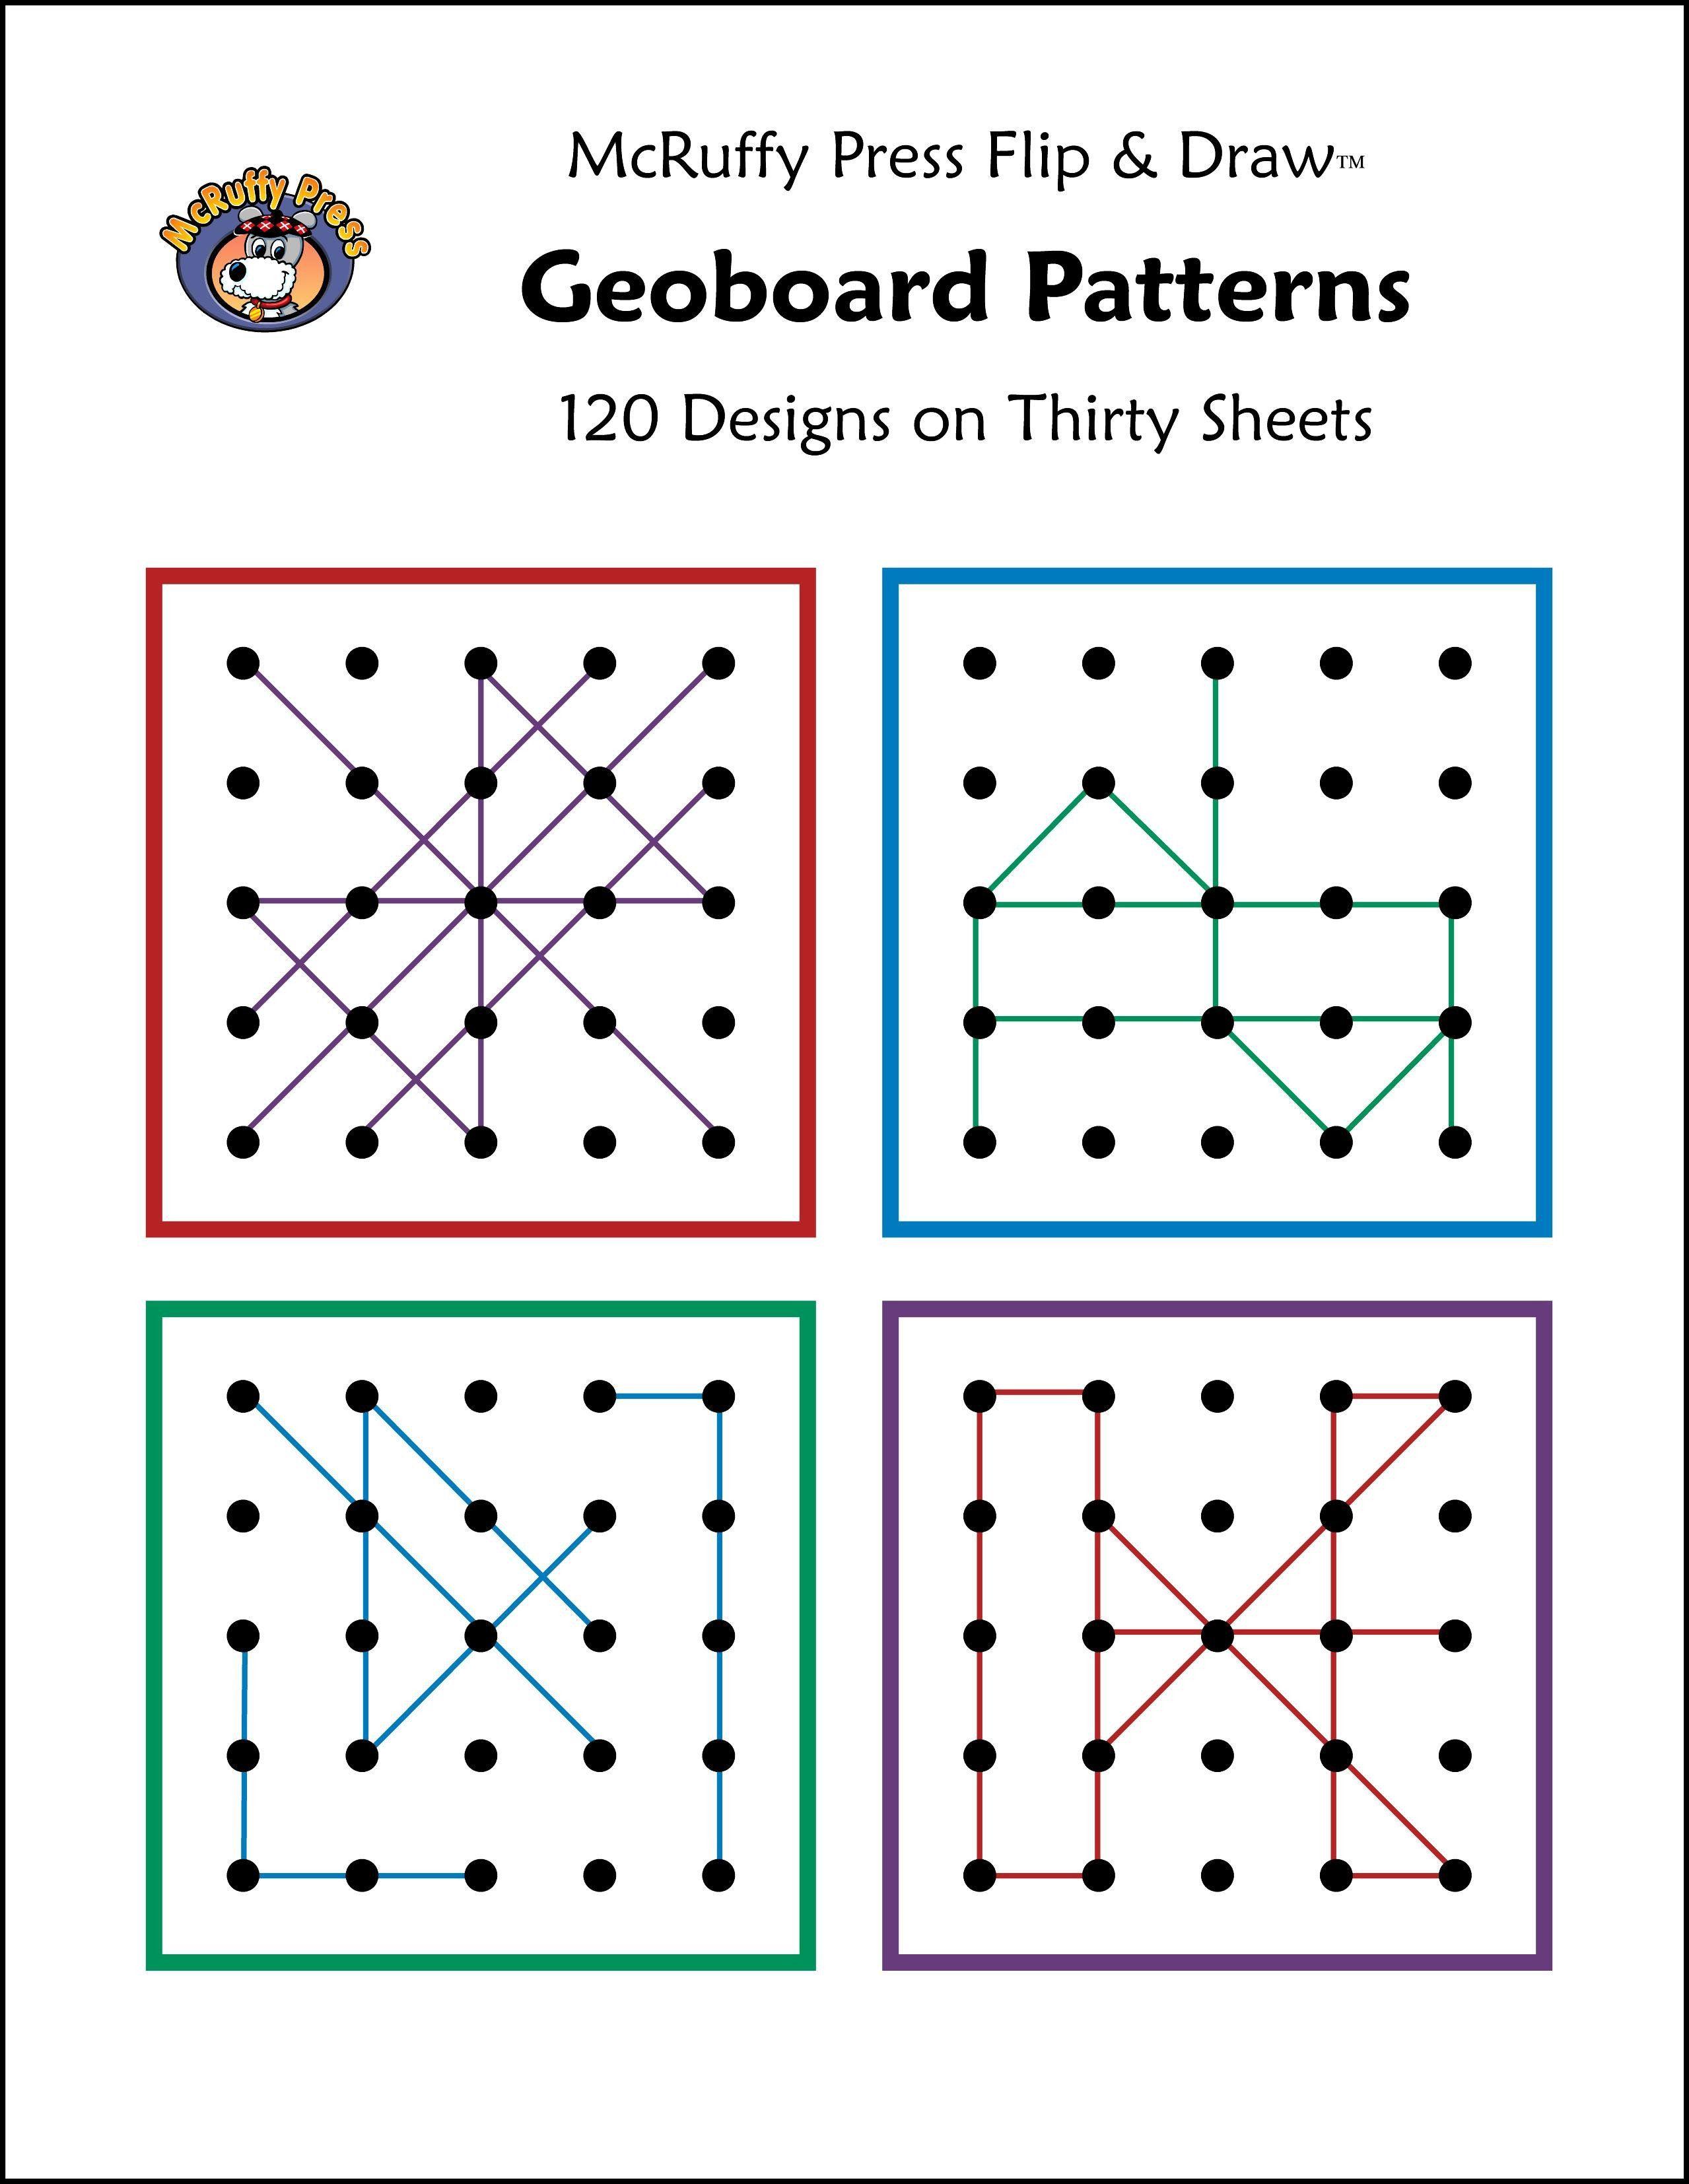 Mcruffy Geoboard Patterns Flip And Draw Book